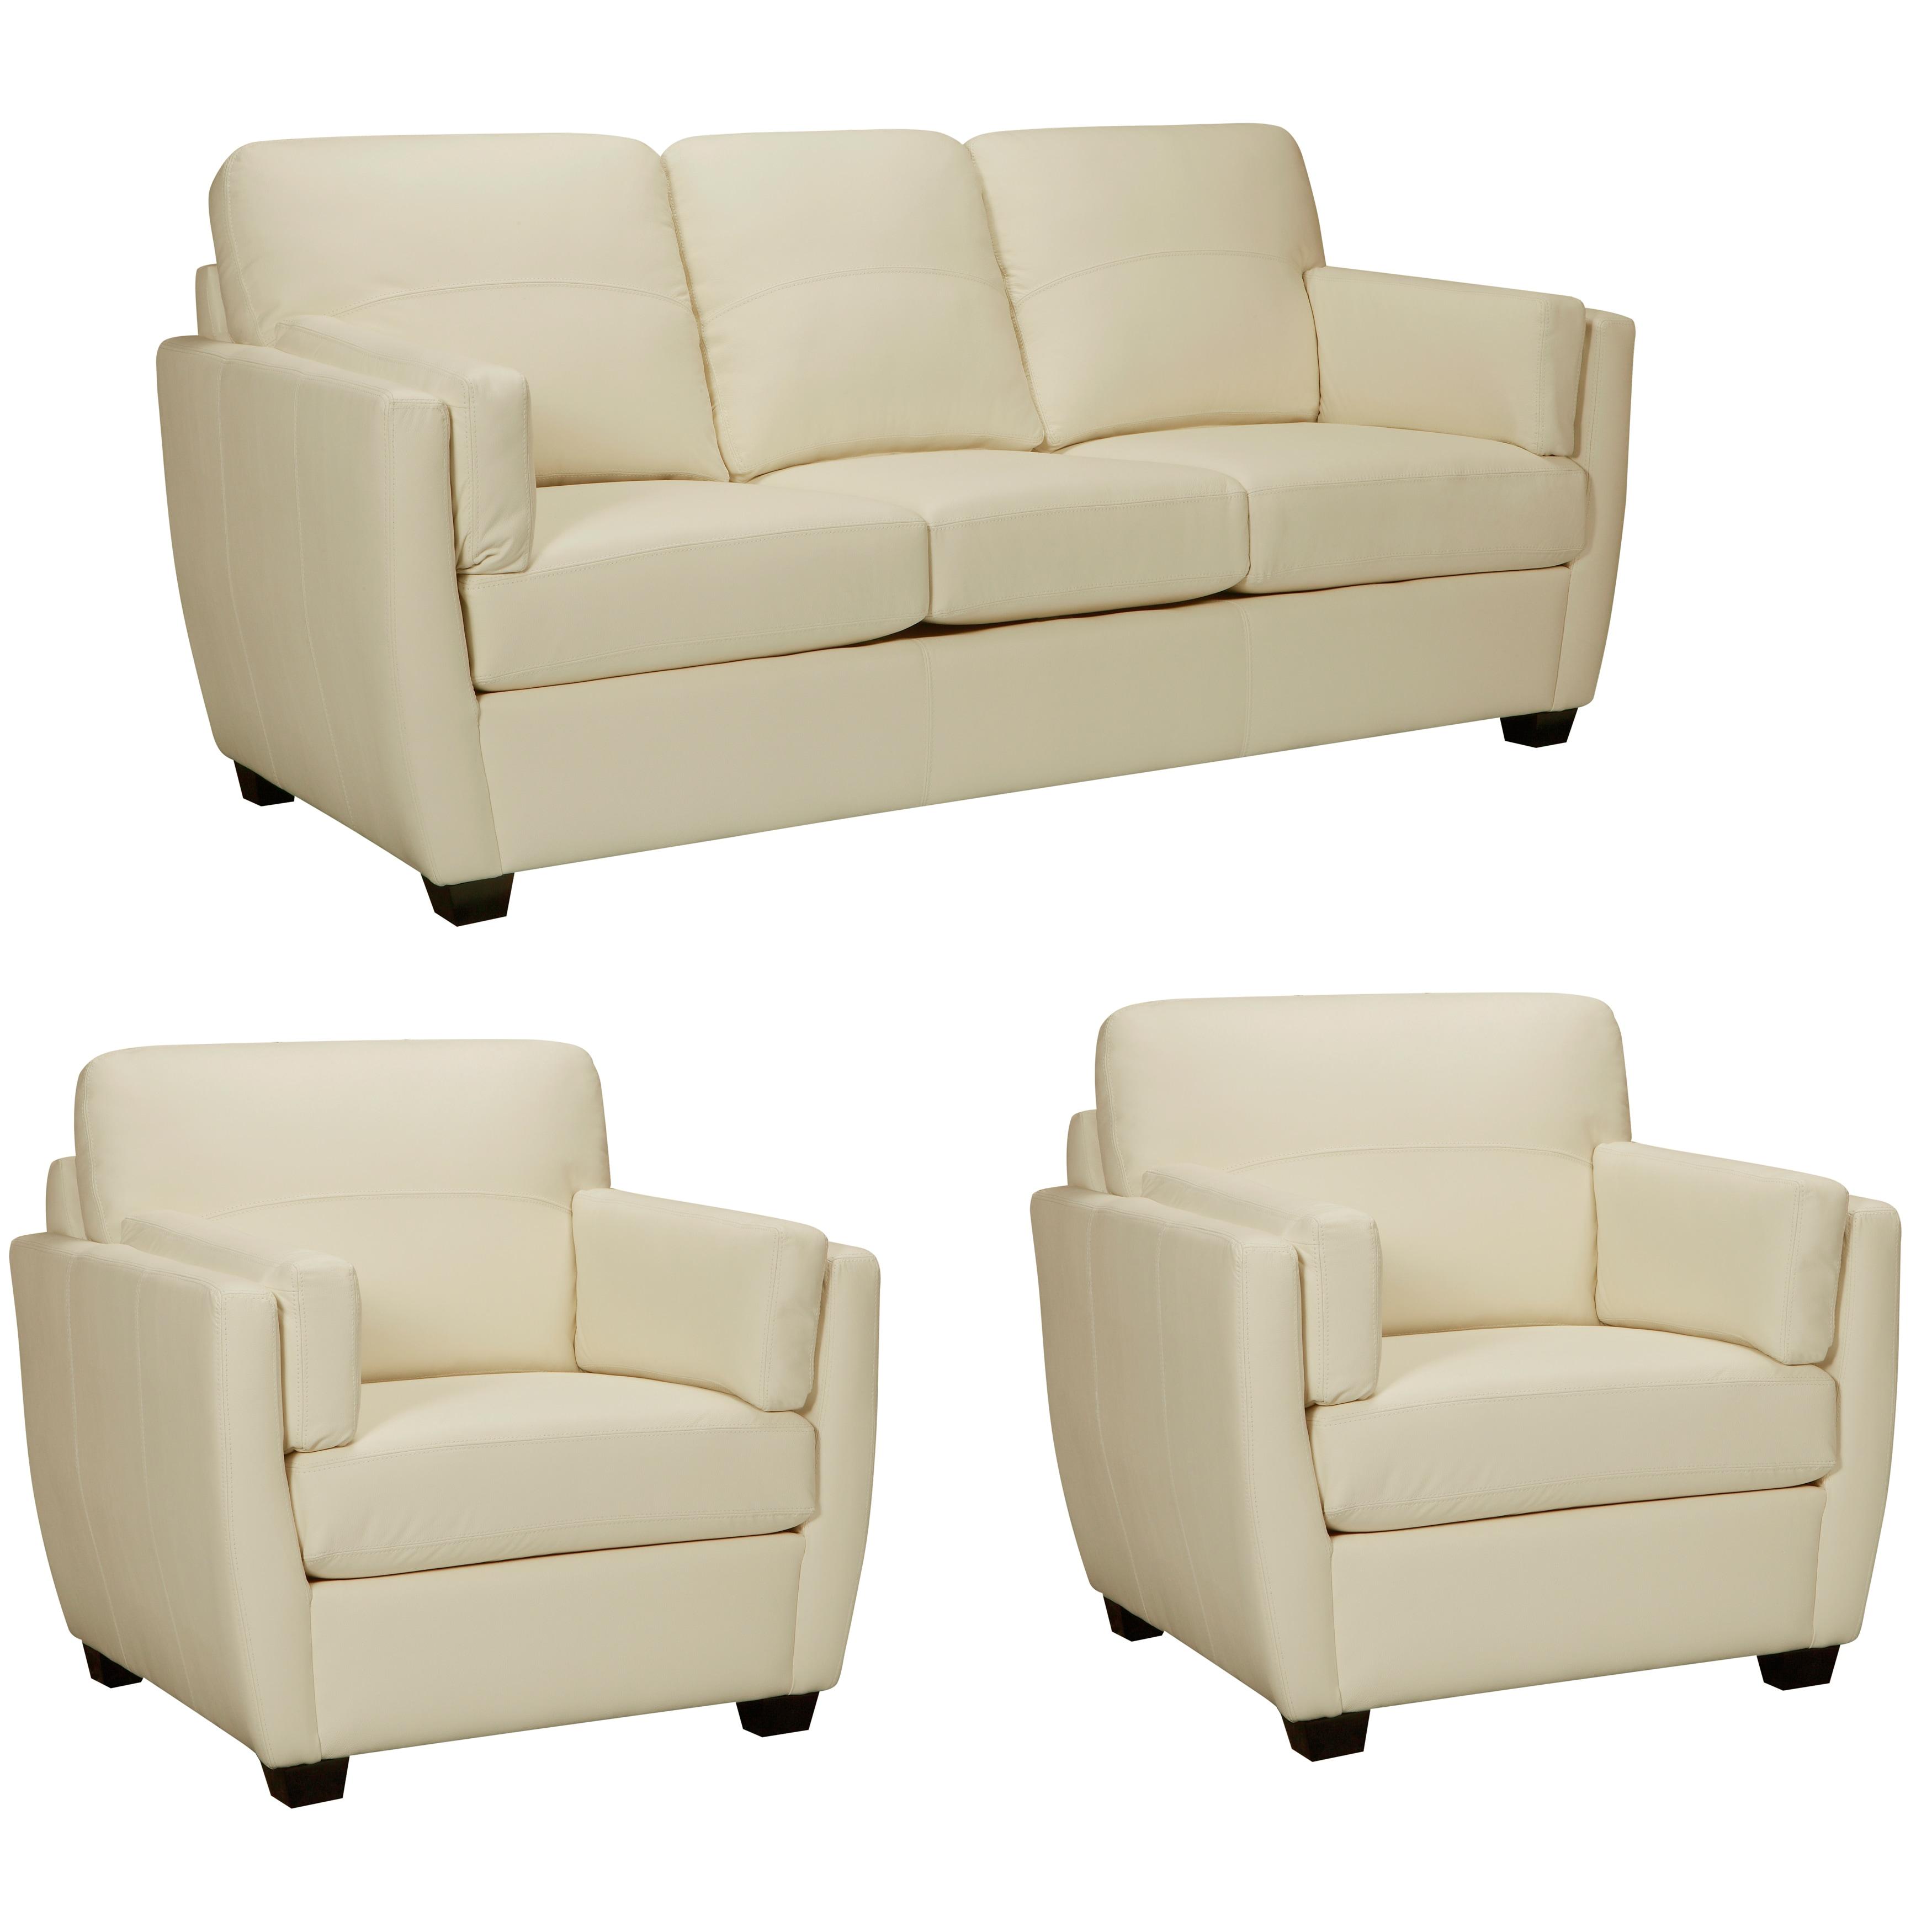 Hamilton Ivory Italian Leather Sofa and Two Chairs Cream